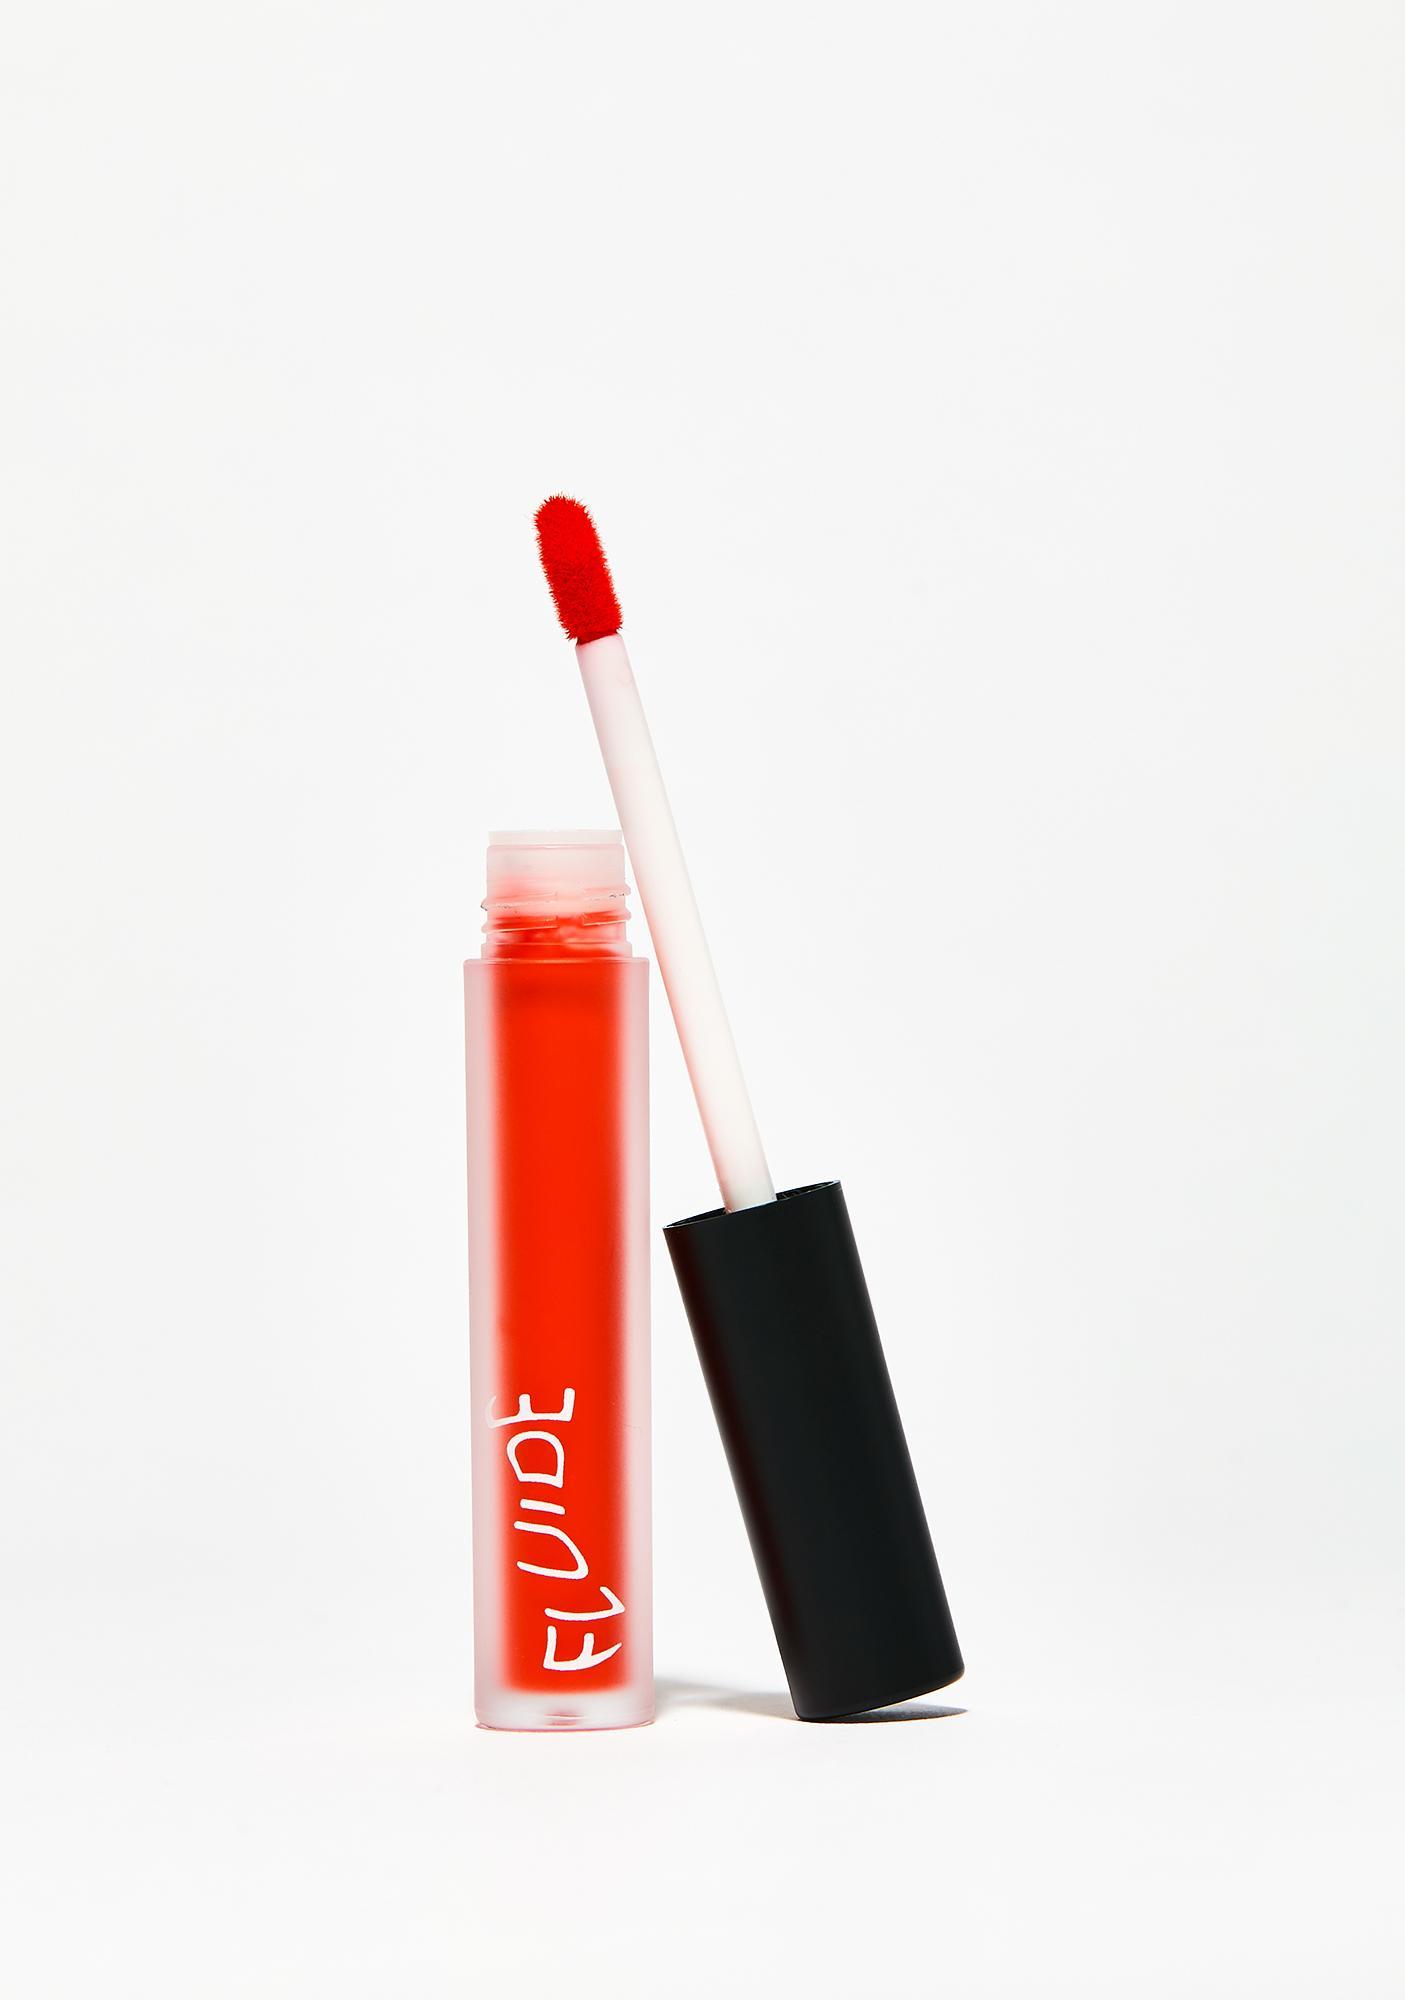 Fluide Ginger's Liquid Lipstick